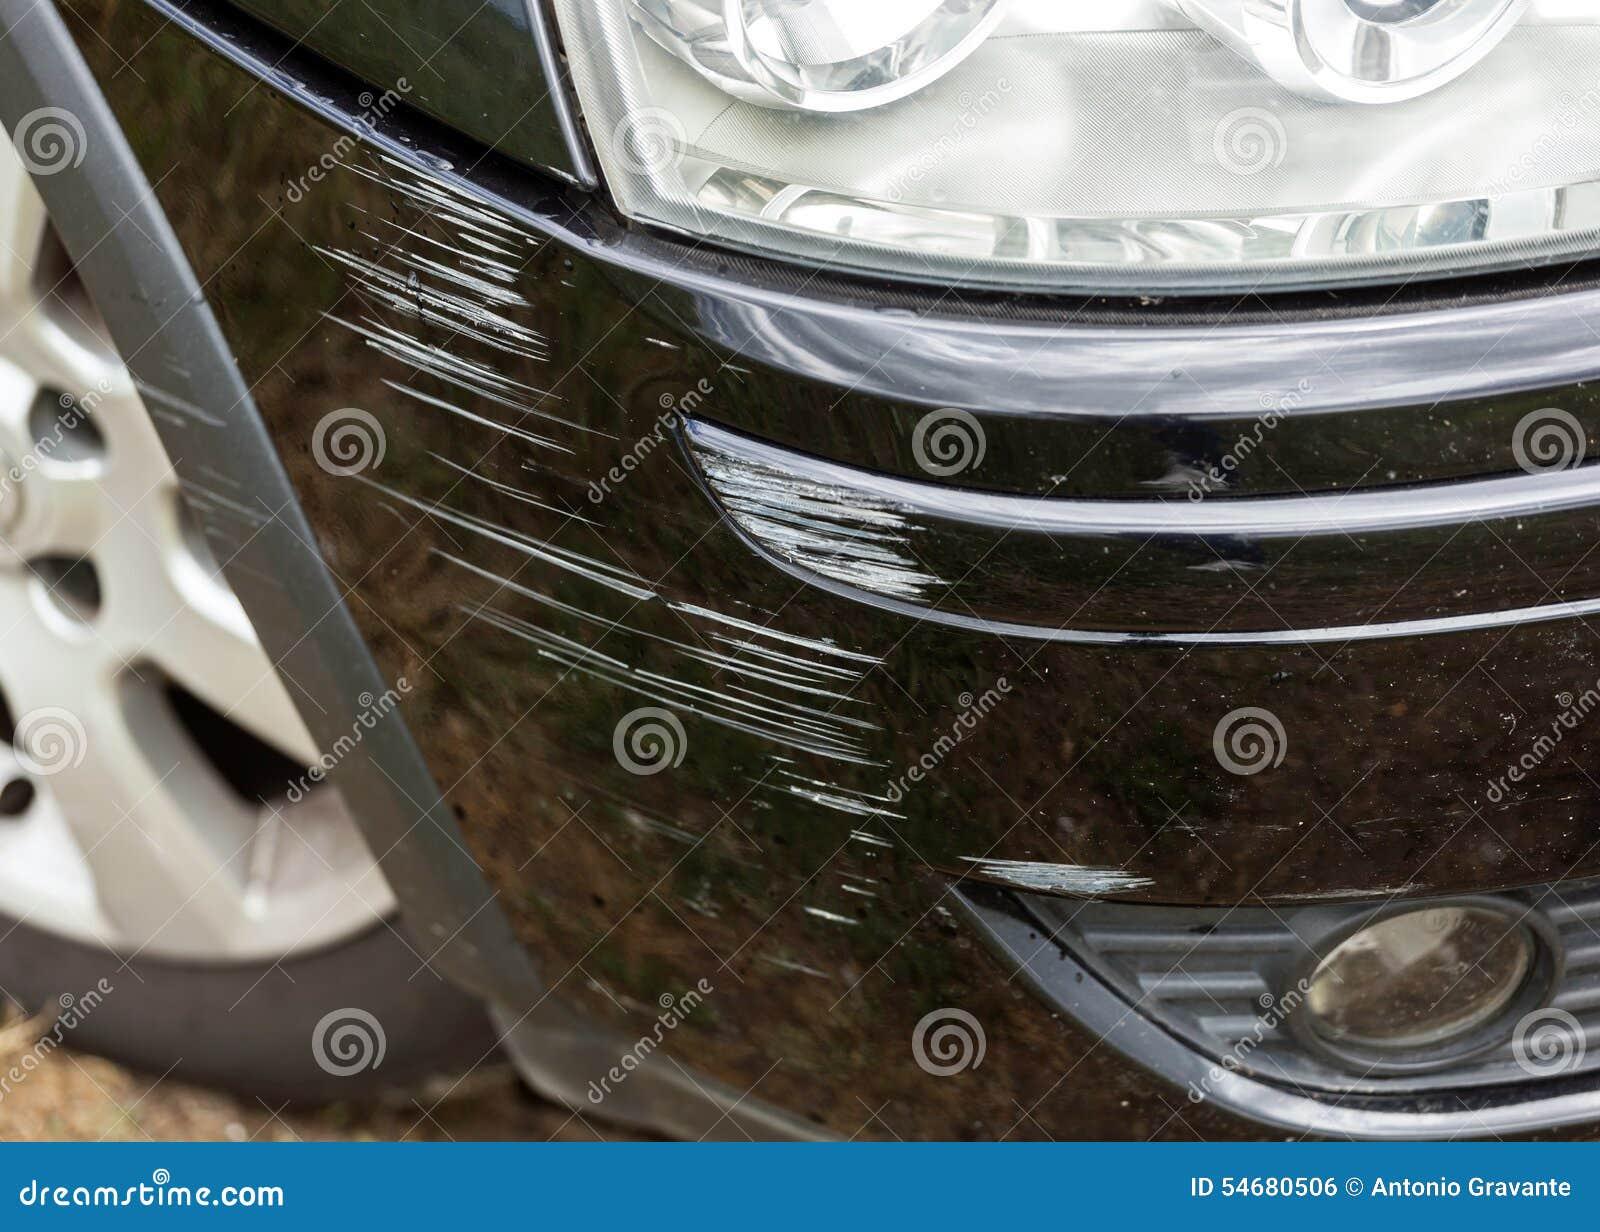 bumper car scratched stock photo image 54680506. Black Bedroom Furniture Sets. Home Design Ideas